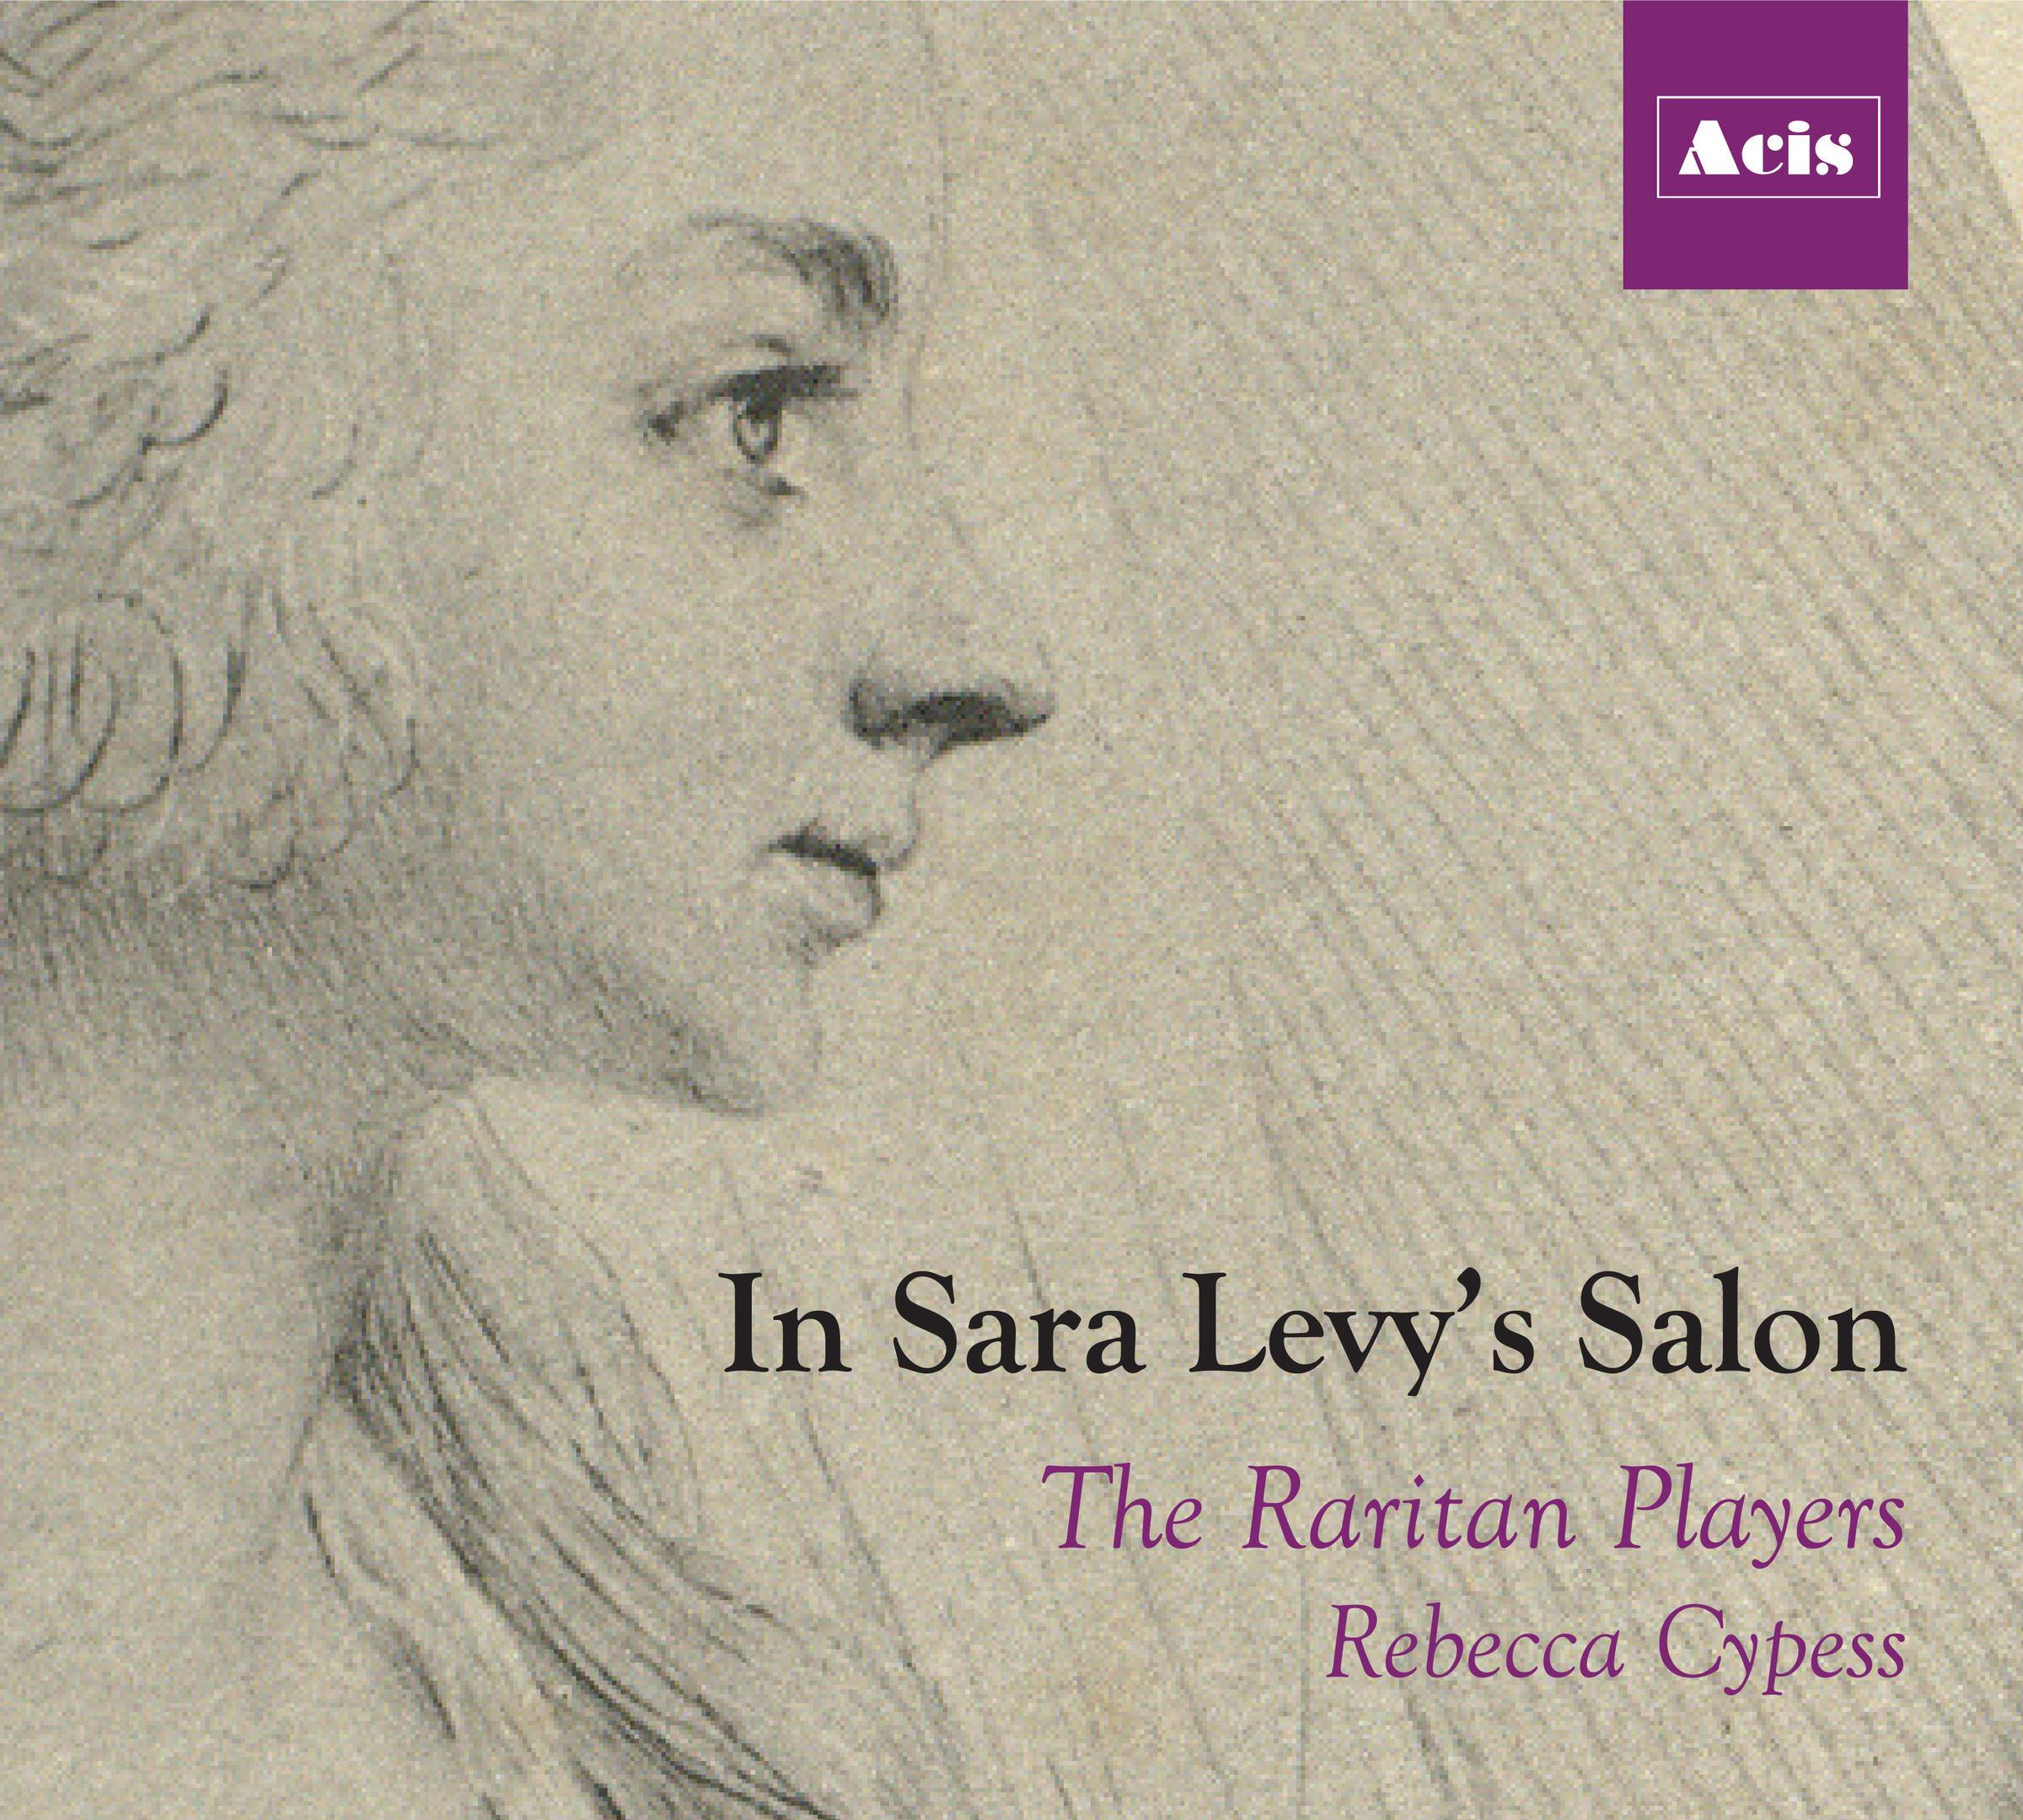 In Sara Levy's Salon